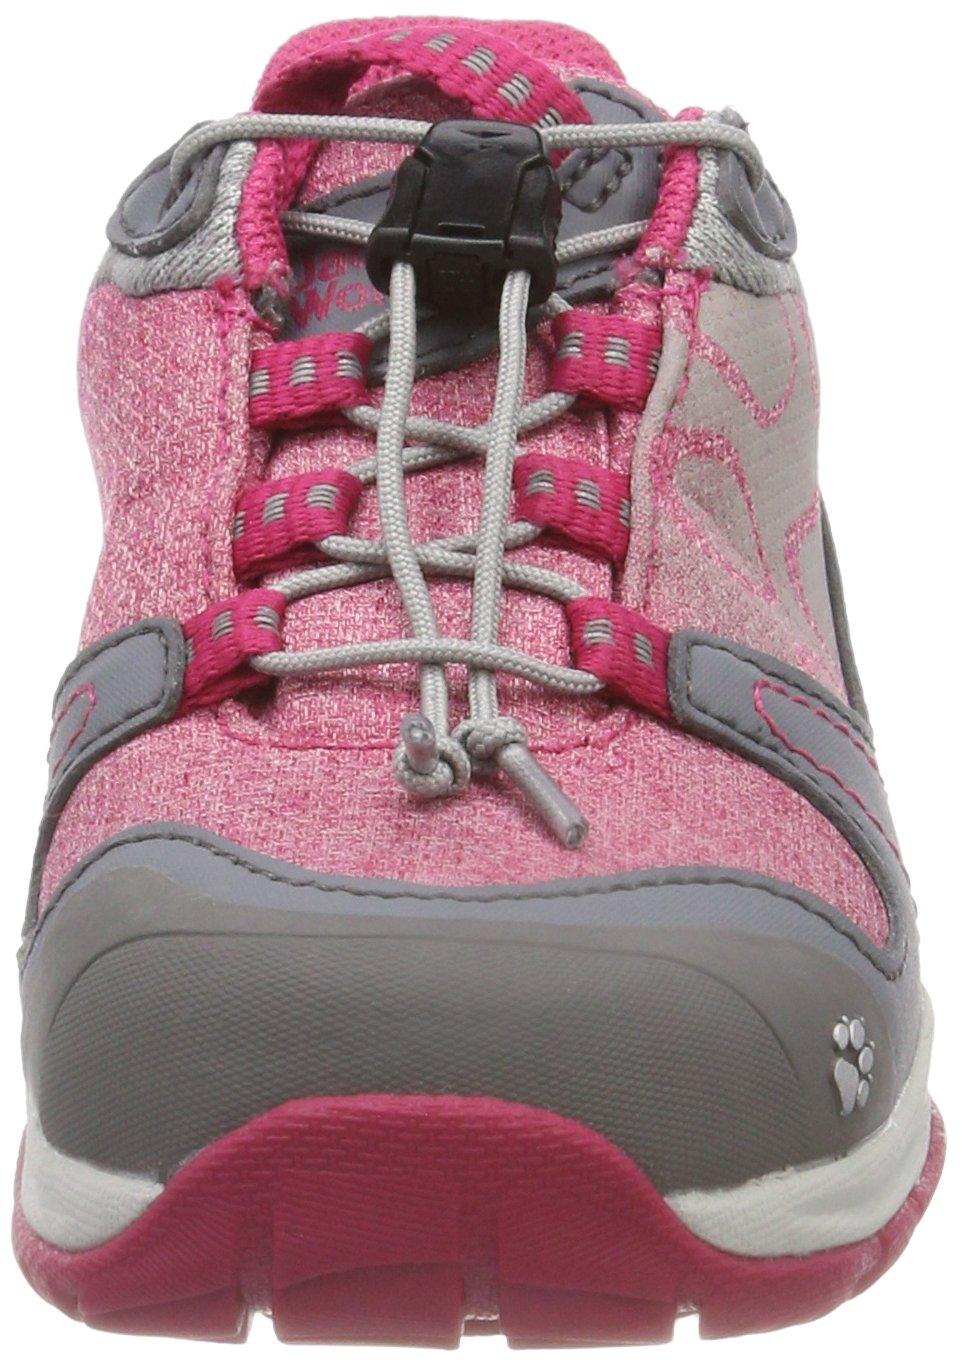 Jack Wolfskin Girls Grivla Texapore Low G Wasserdicht Rise Hiking Shoes 4